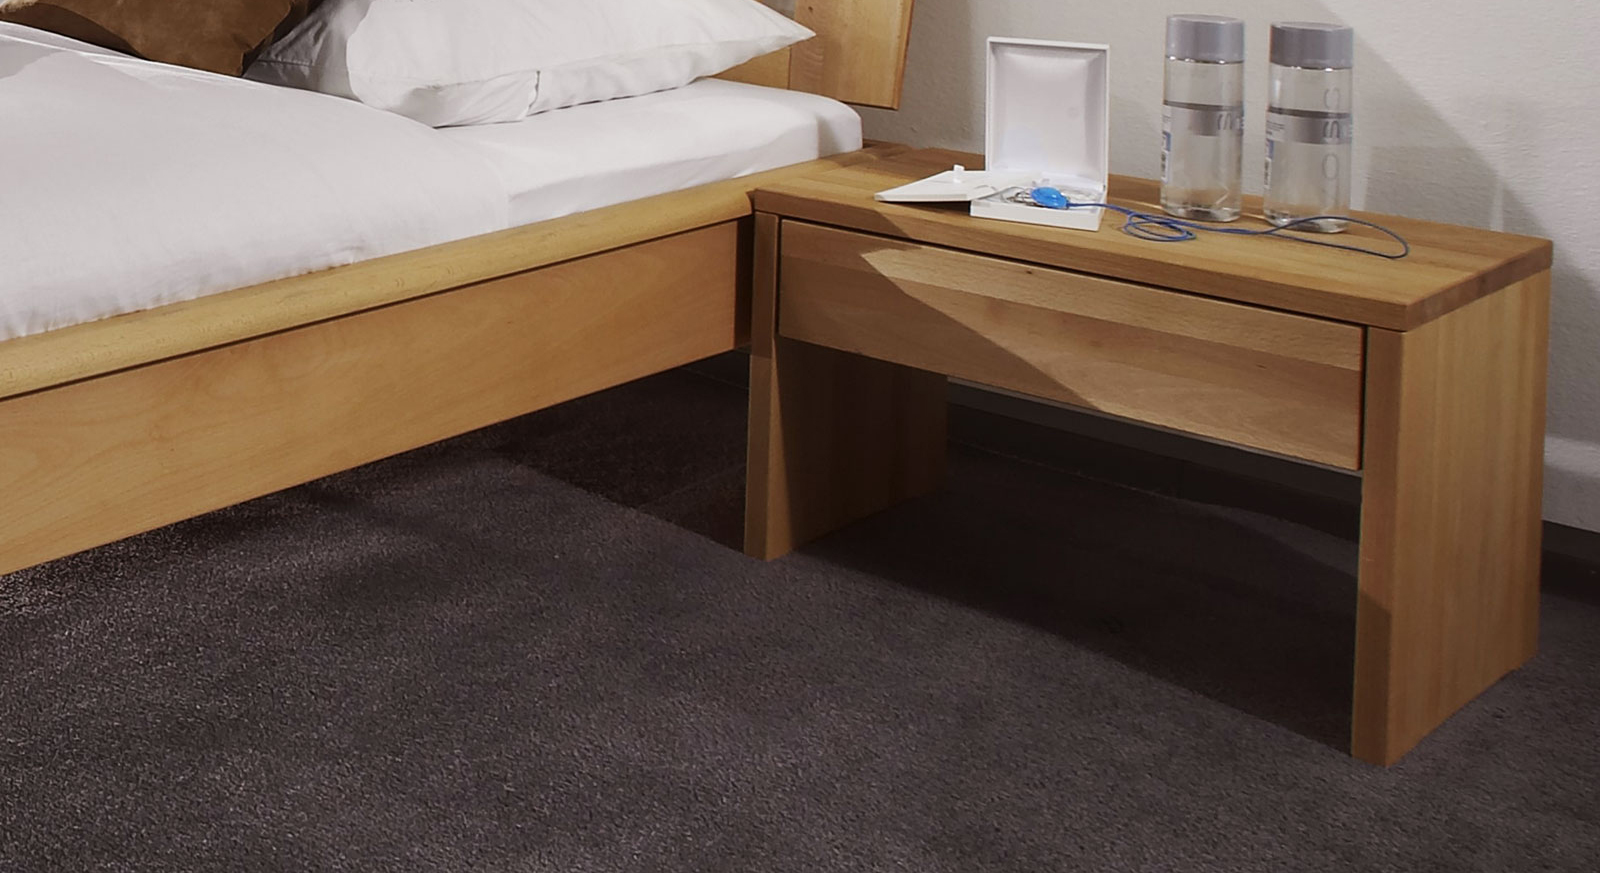 nachttisch massivholz buche great affordable massivholz nachttisch eiche massiv vera wildeiche. Black Bedroom Furniture Sets. Home Design Ideas